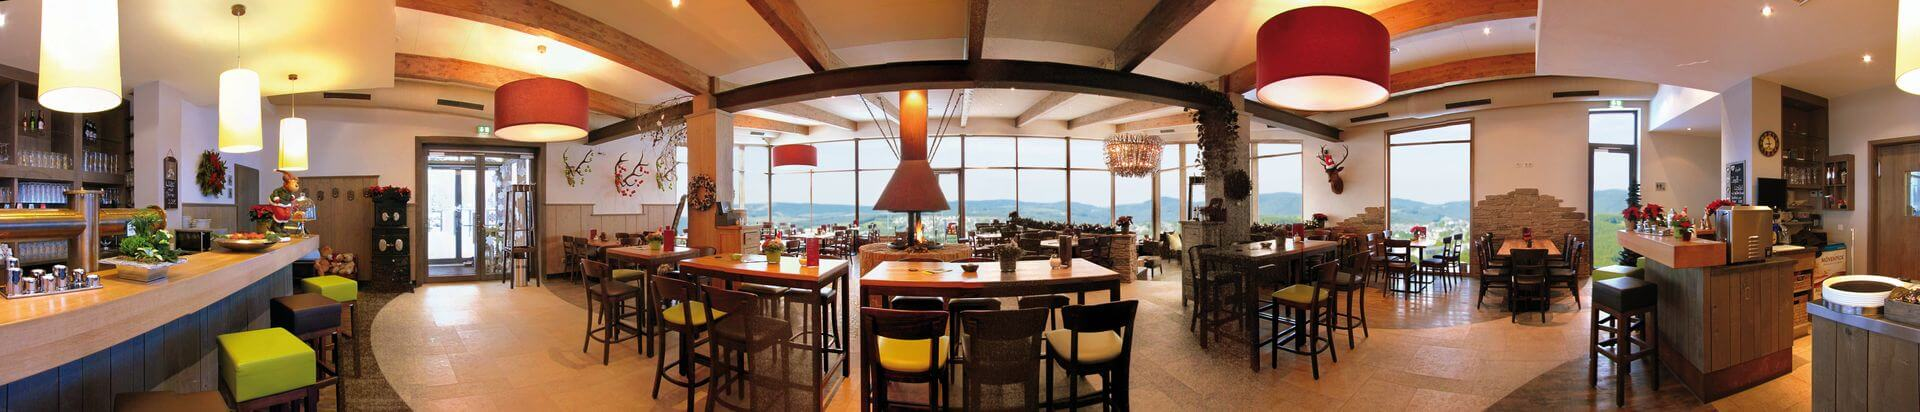 Betriebsferien im Panorama Café - Restaurant